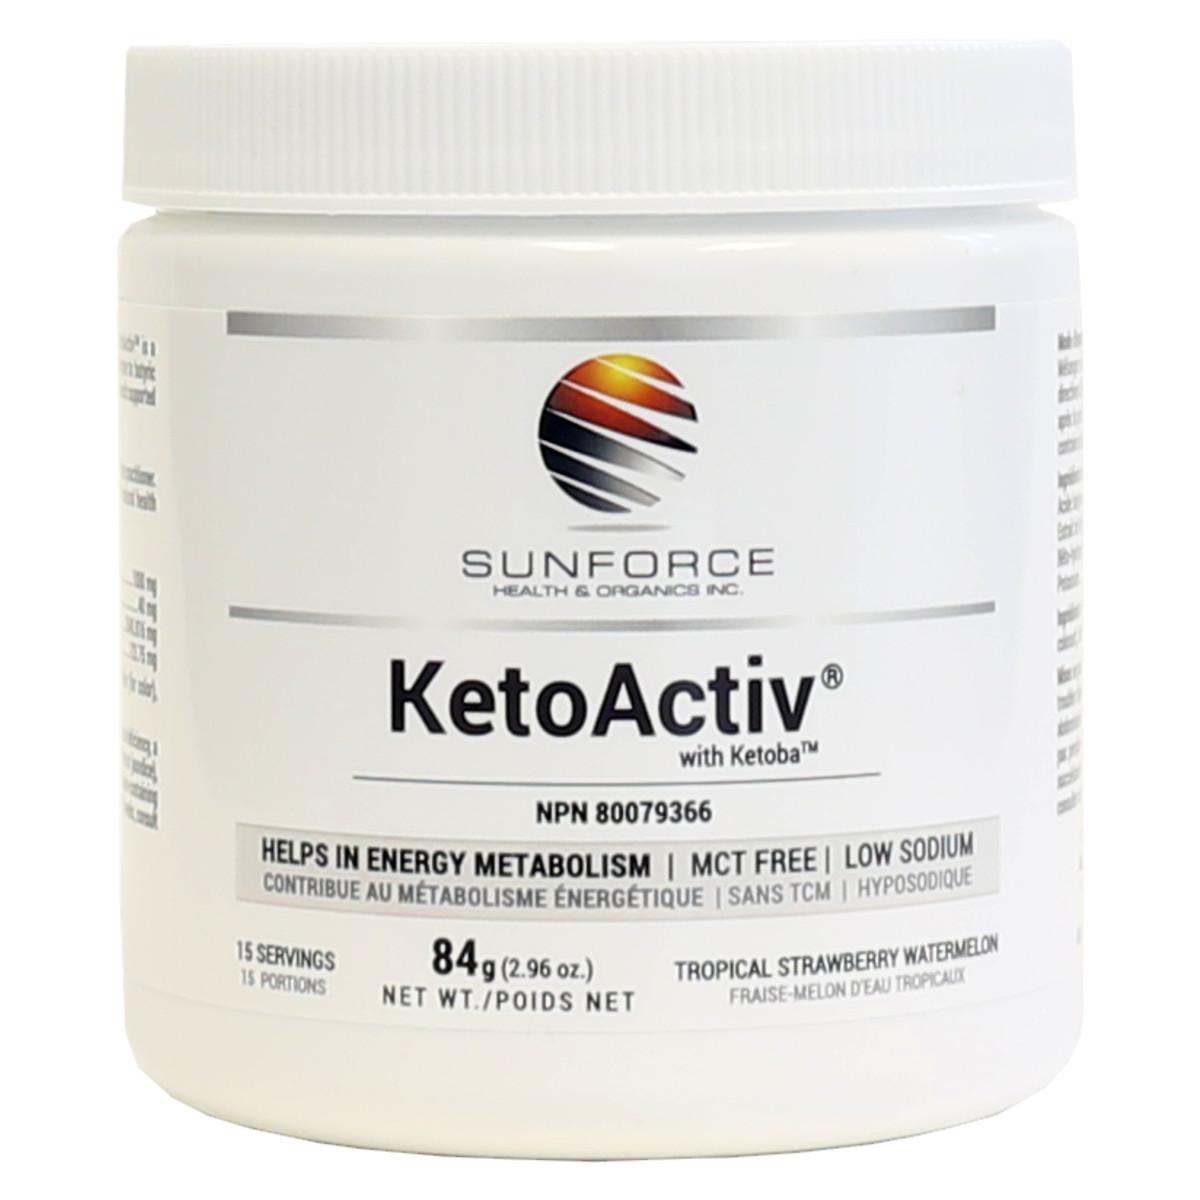 KetoActiv, Sunforce 84g